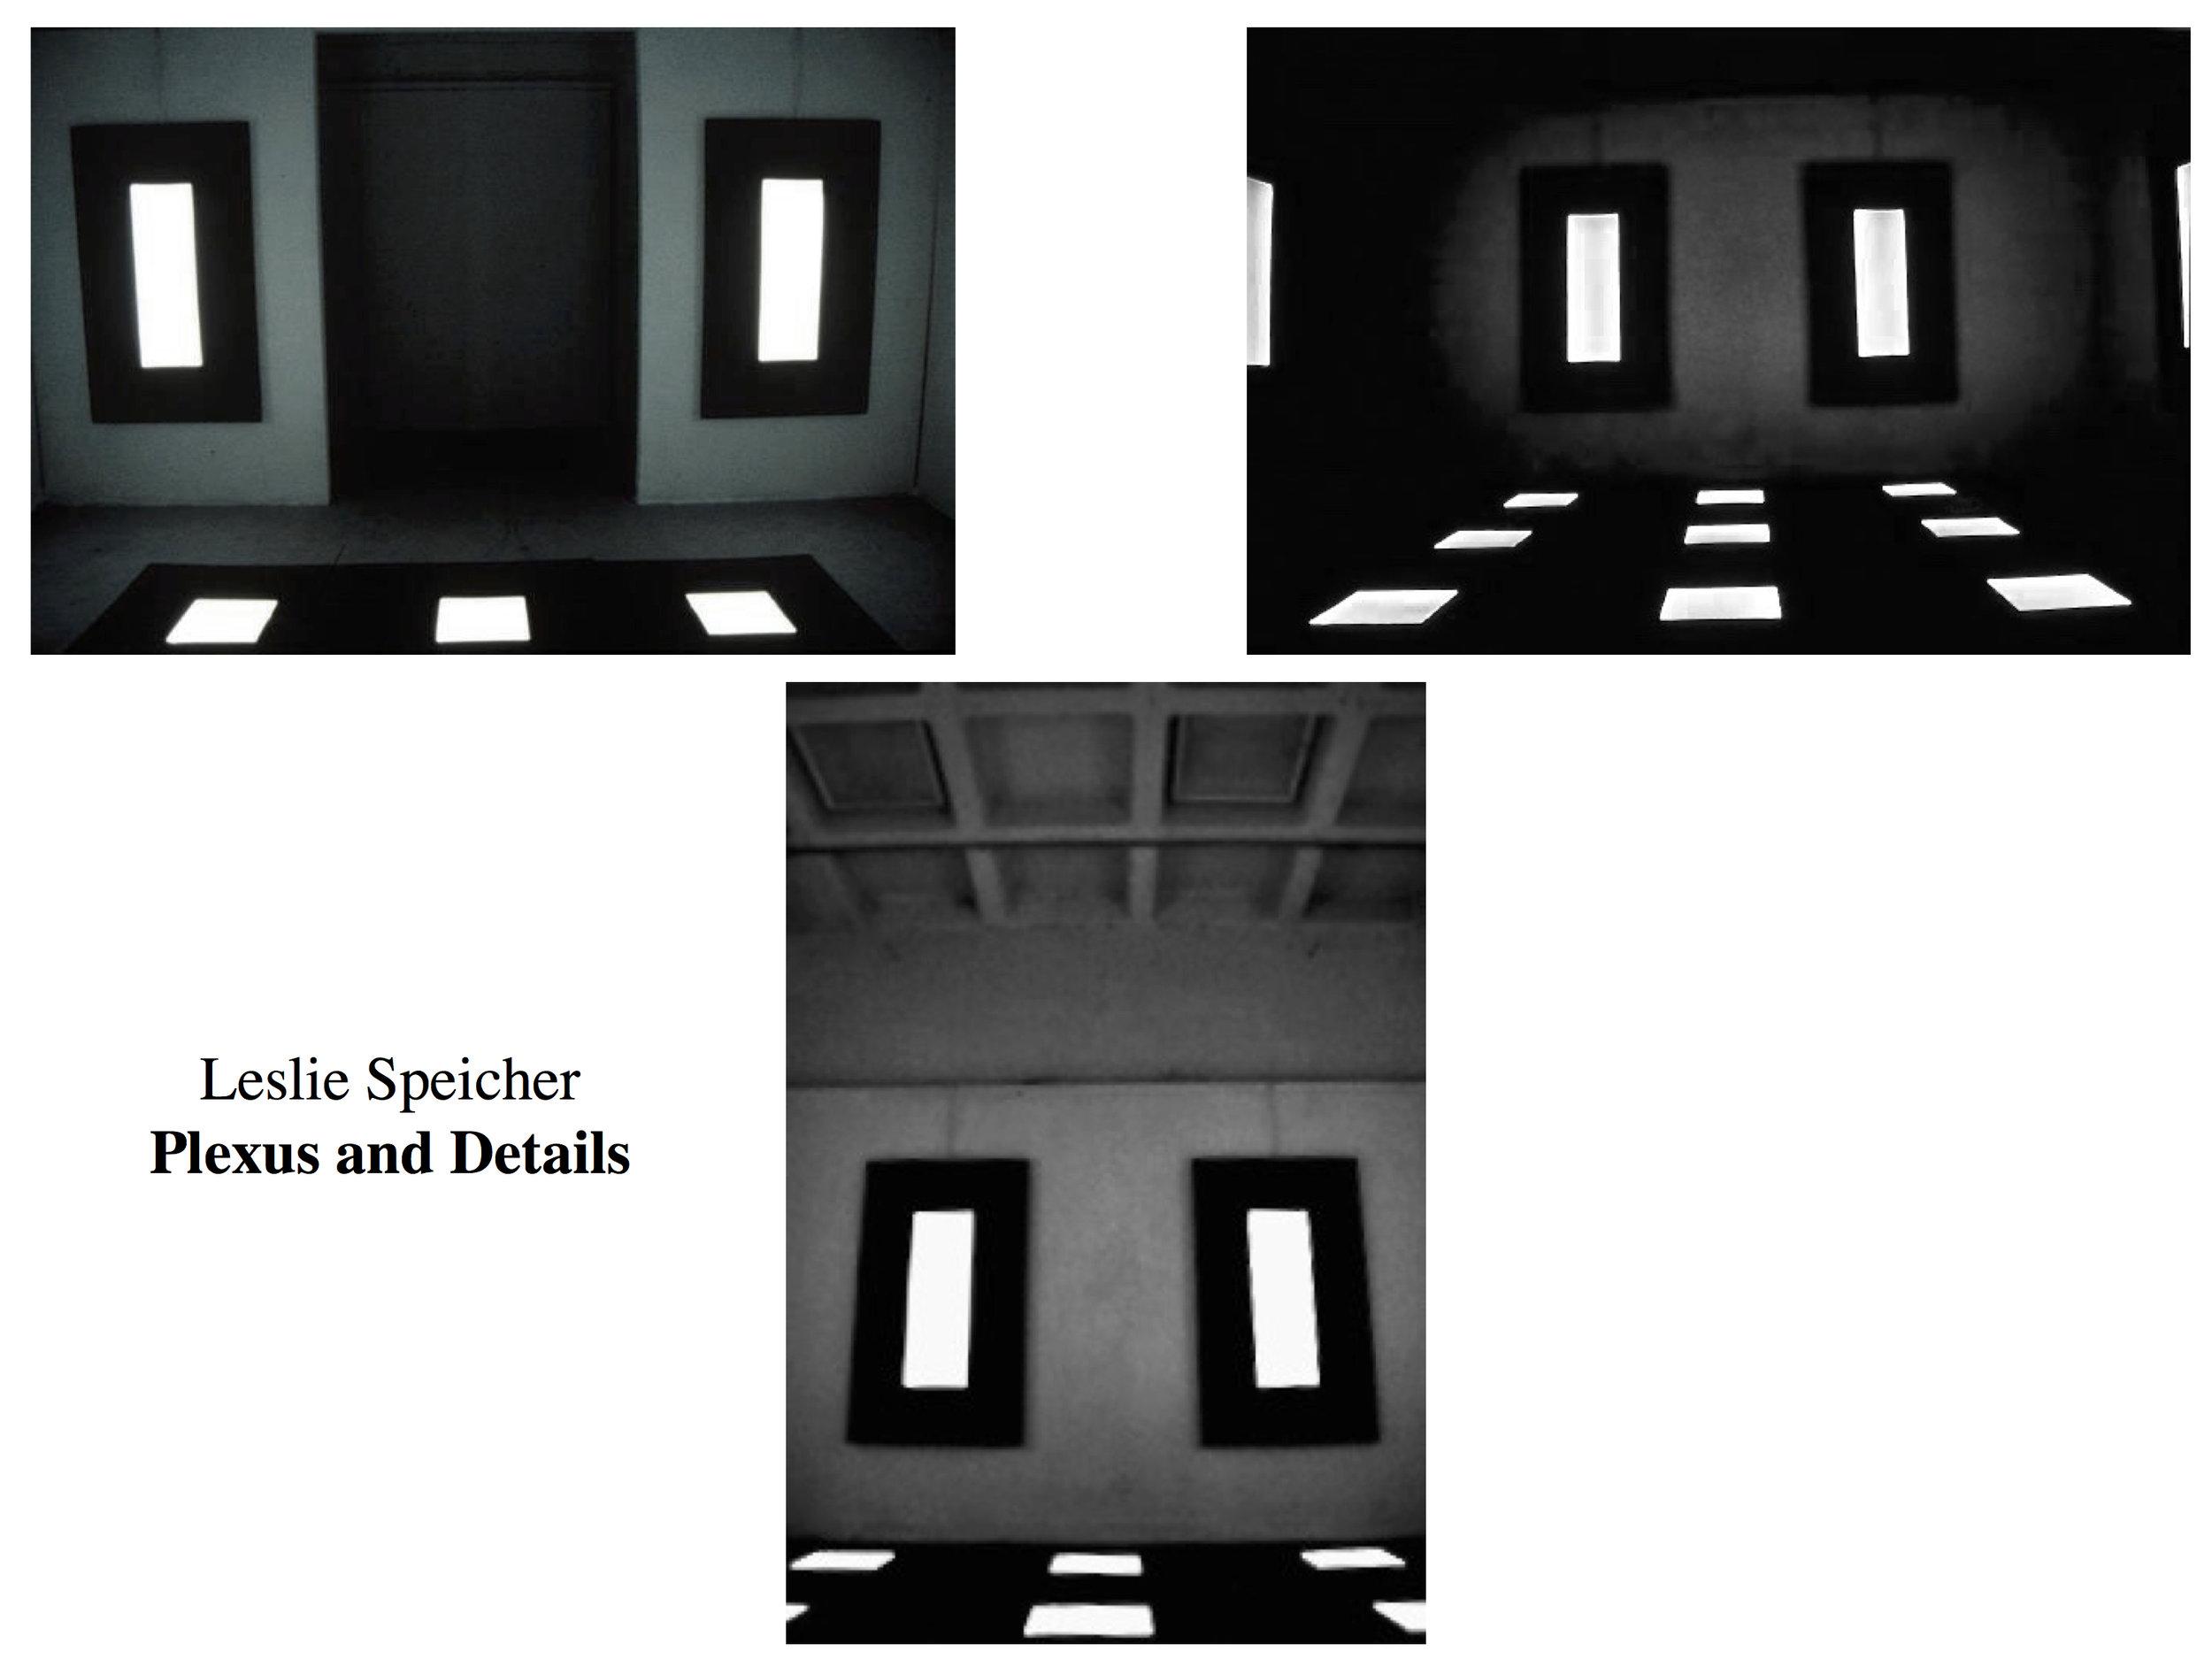 L. Speicher Plexus and Details.jpeg